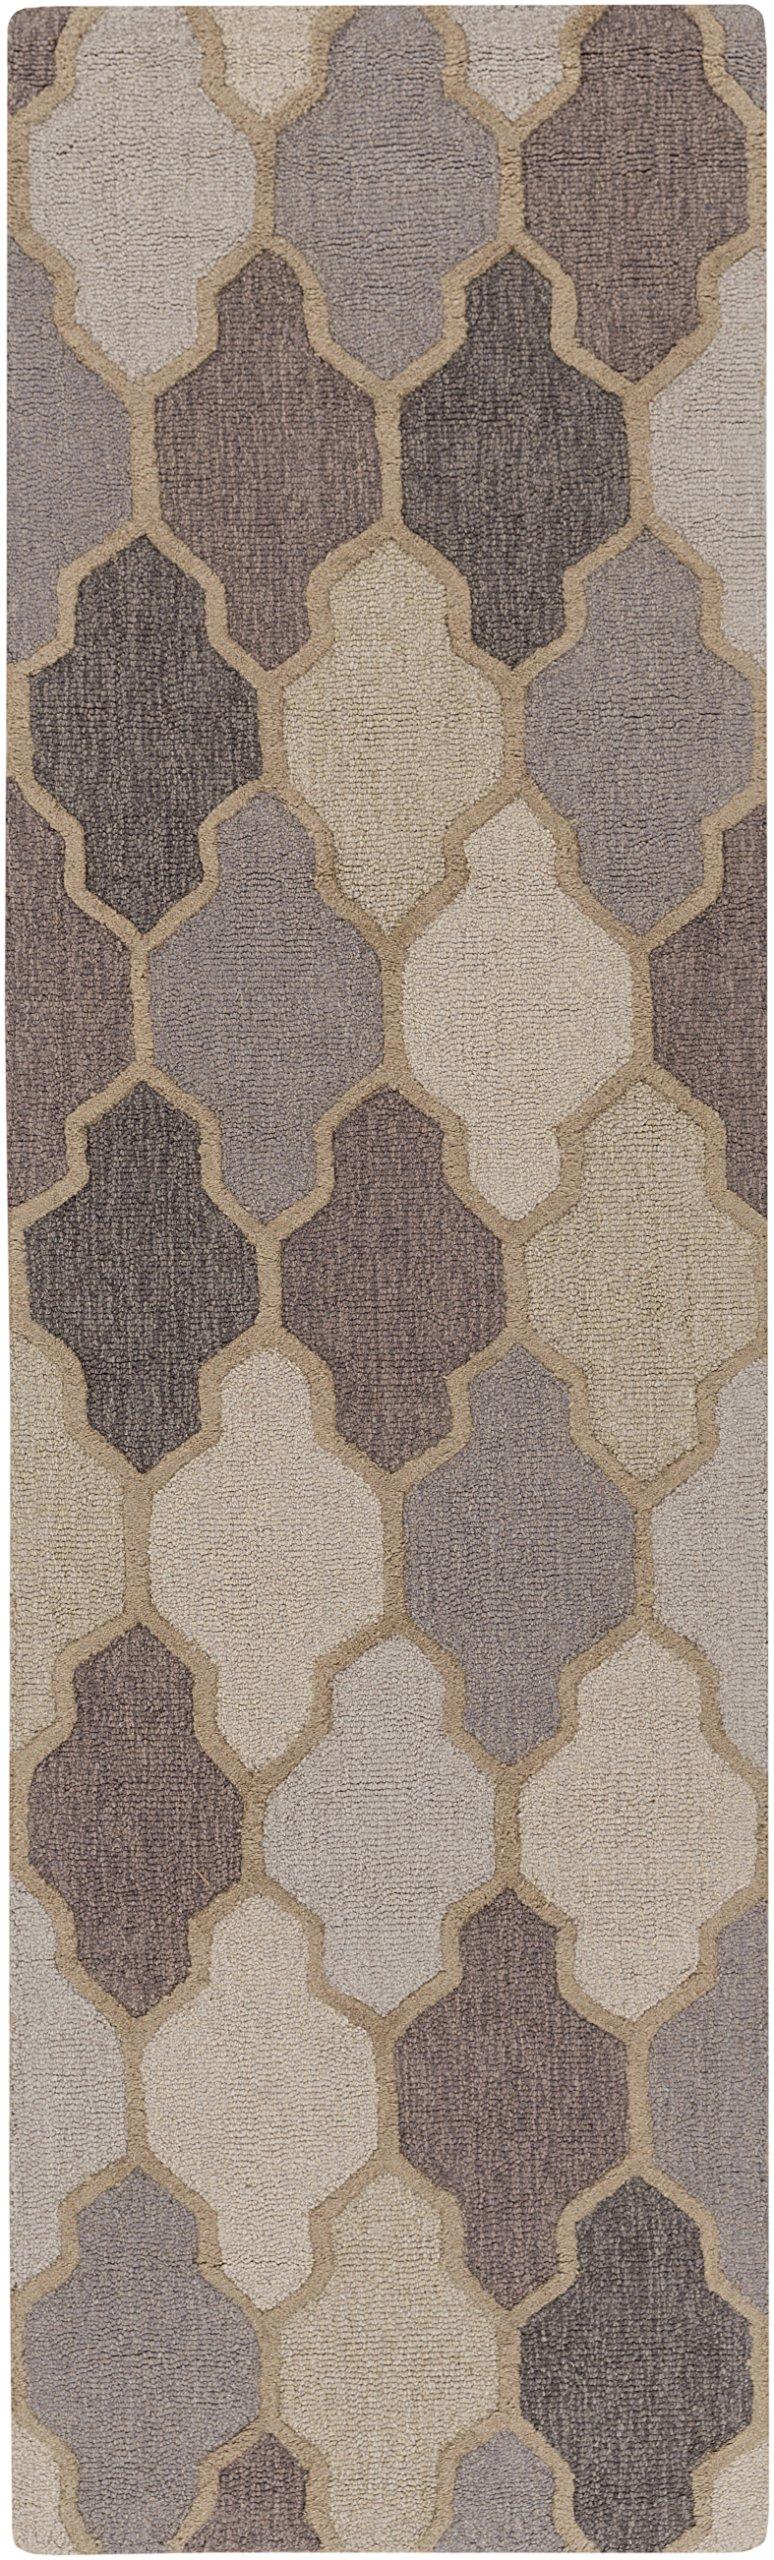 Artistic Weavers AWAH2037-46 Pollack Morgan Rug, 4' x 6' by Artistic Weavers